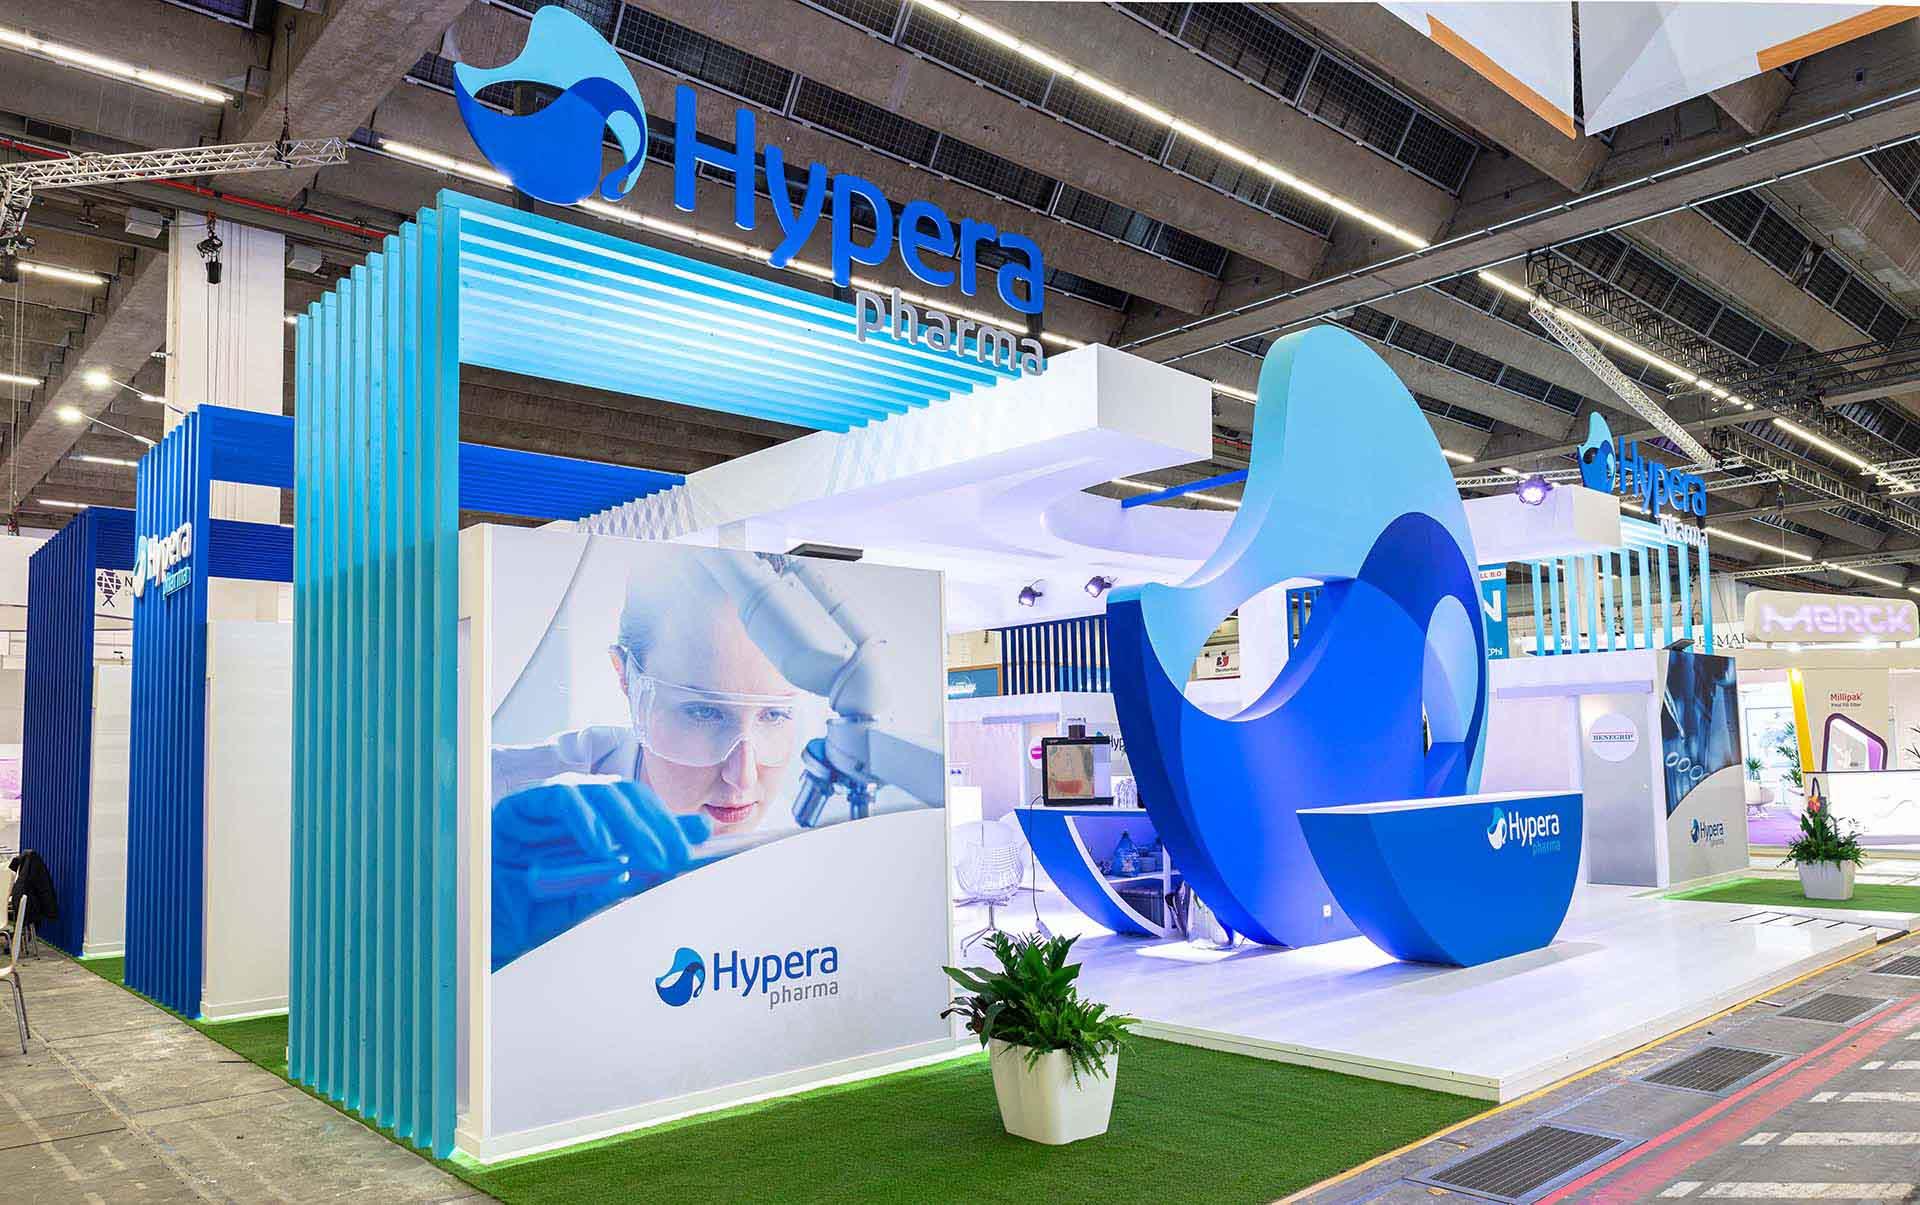 Stand Hypera Design